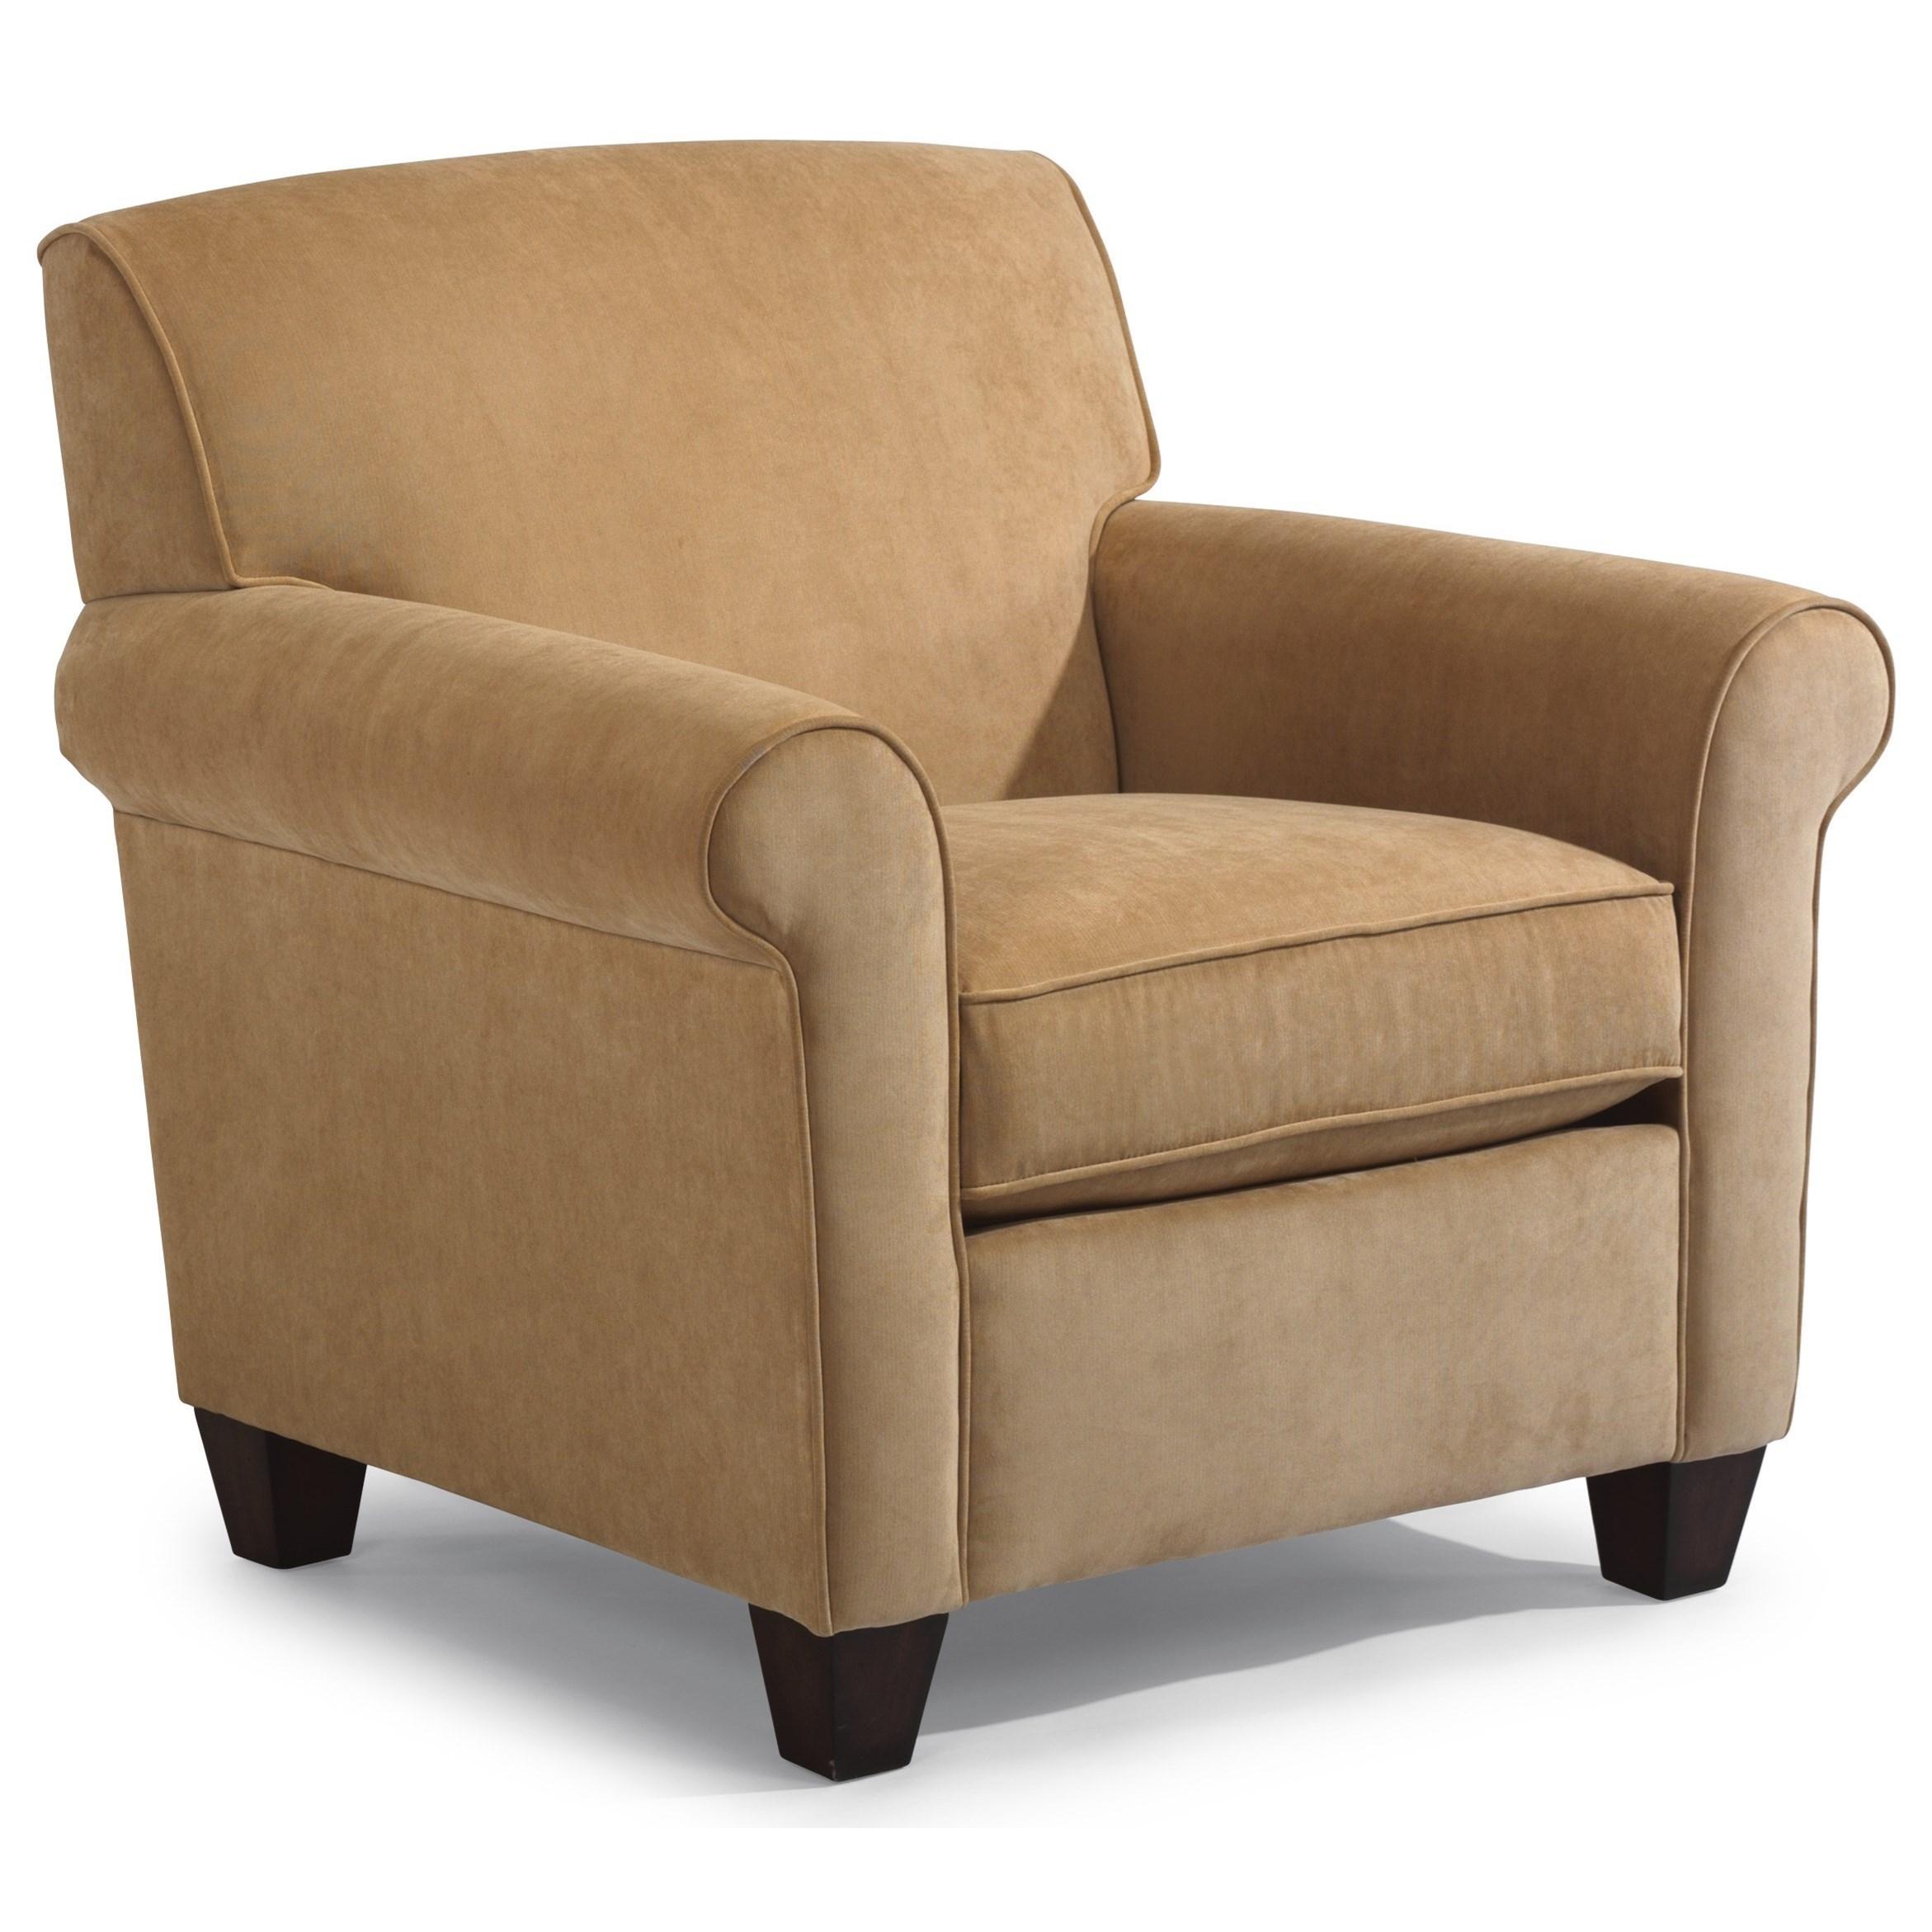 Dana Upholstered Chair by Flexsteel at Jordan's Home Furnishings